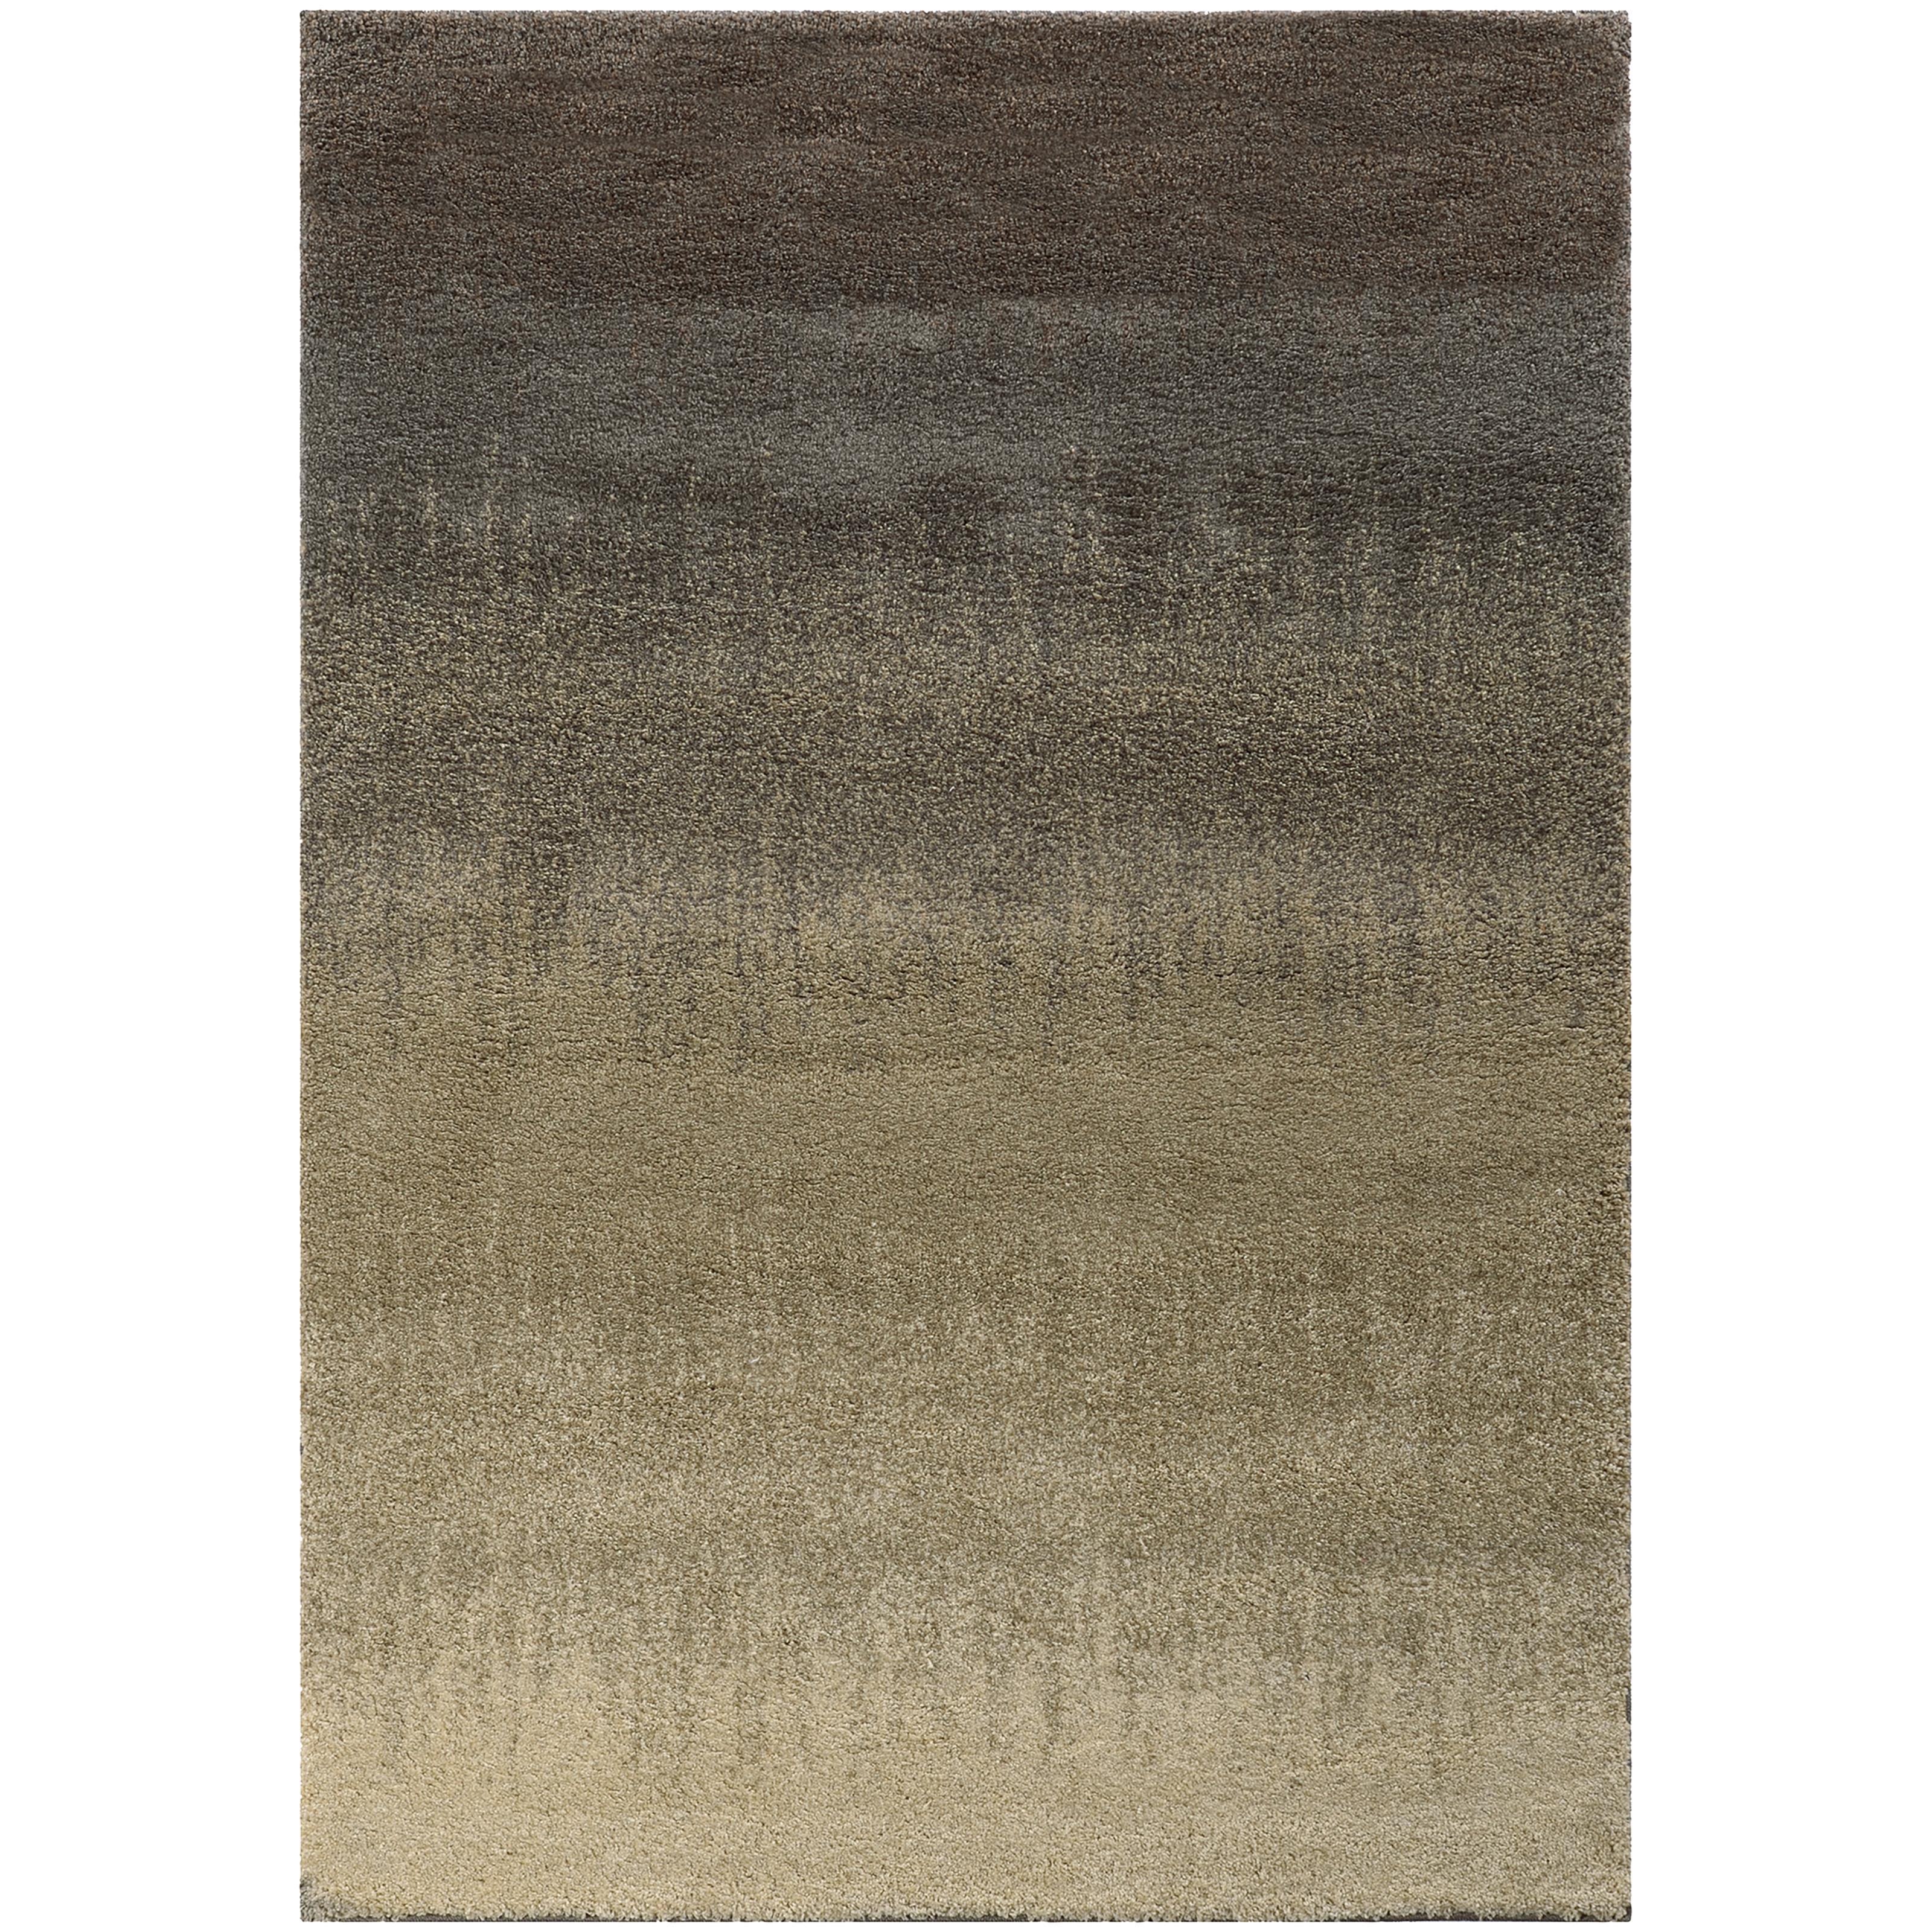 "Oriental Weavers Covington 7'10"" X 10'10"" Rug - Item Number: C002J6240330ST"